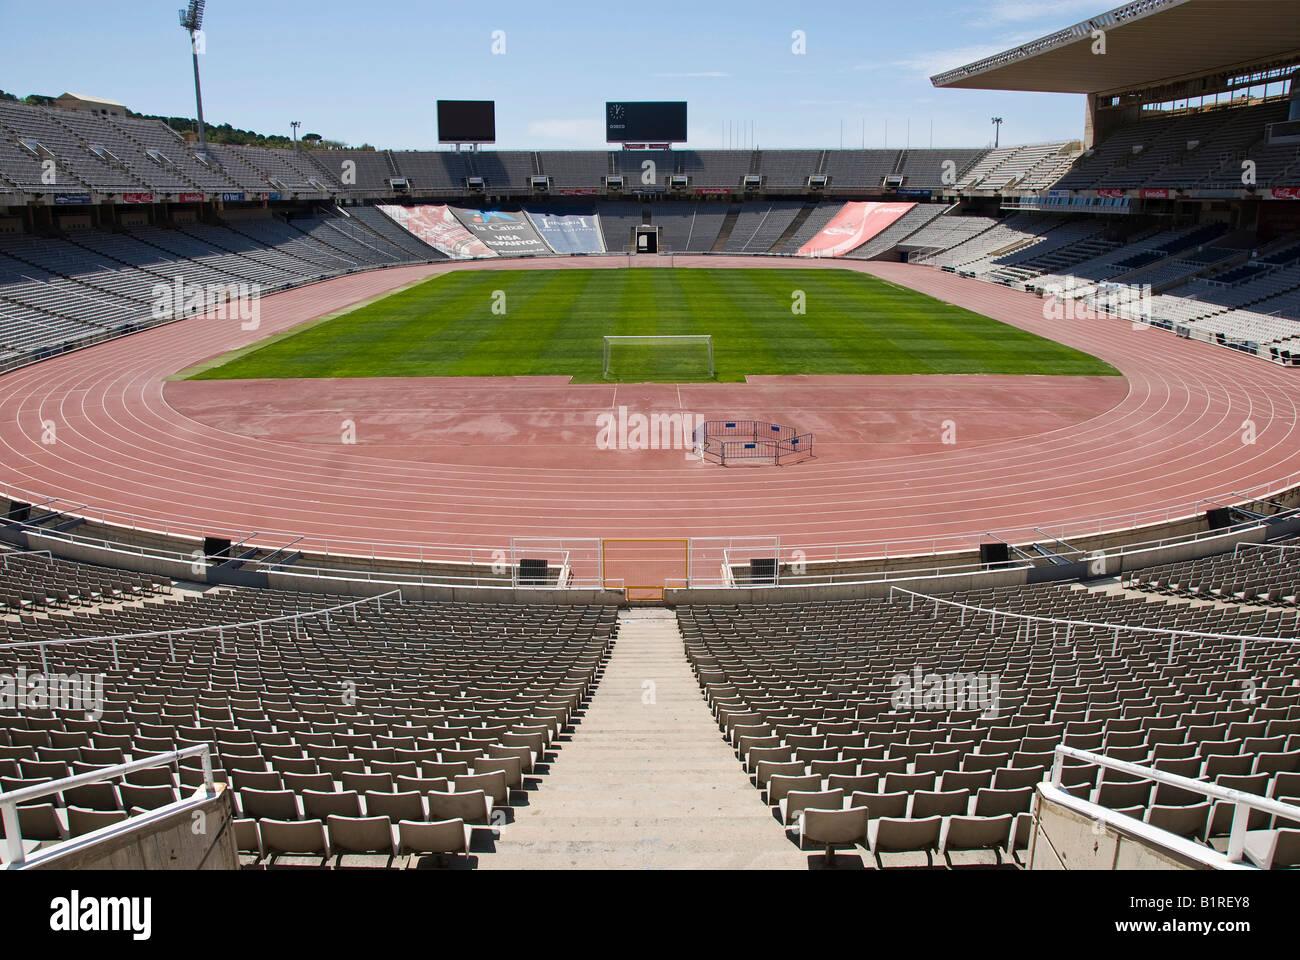 Olympic Stadium Estadi Olímpic Lluís Companys, formerly known as the Estadi Olímpic de Montjuïc, - Stock Image